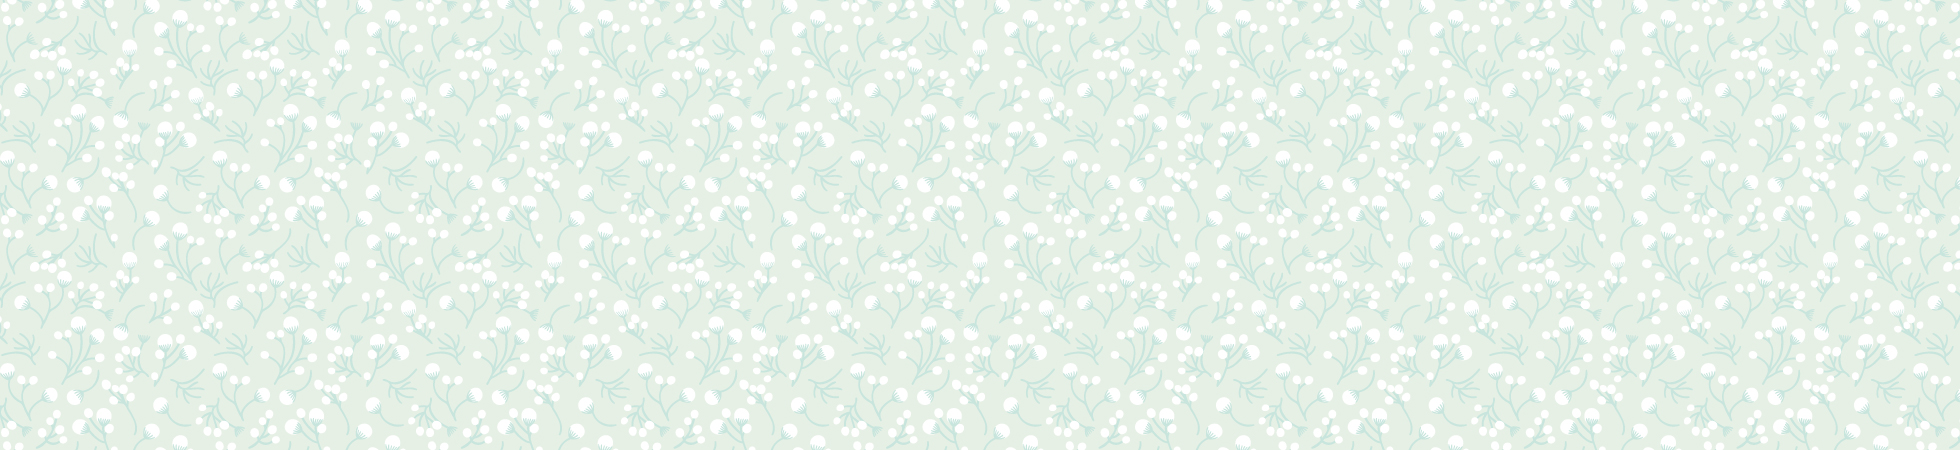 barbara-salez-banniere-design-textile-1